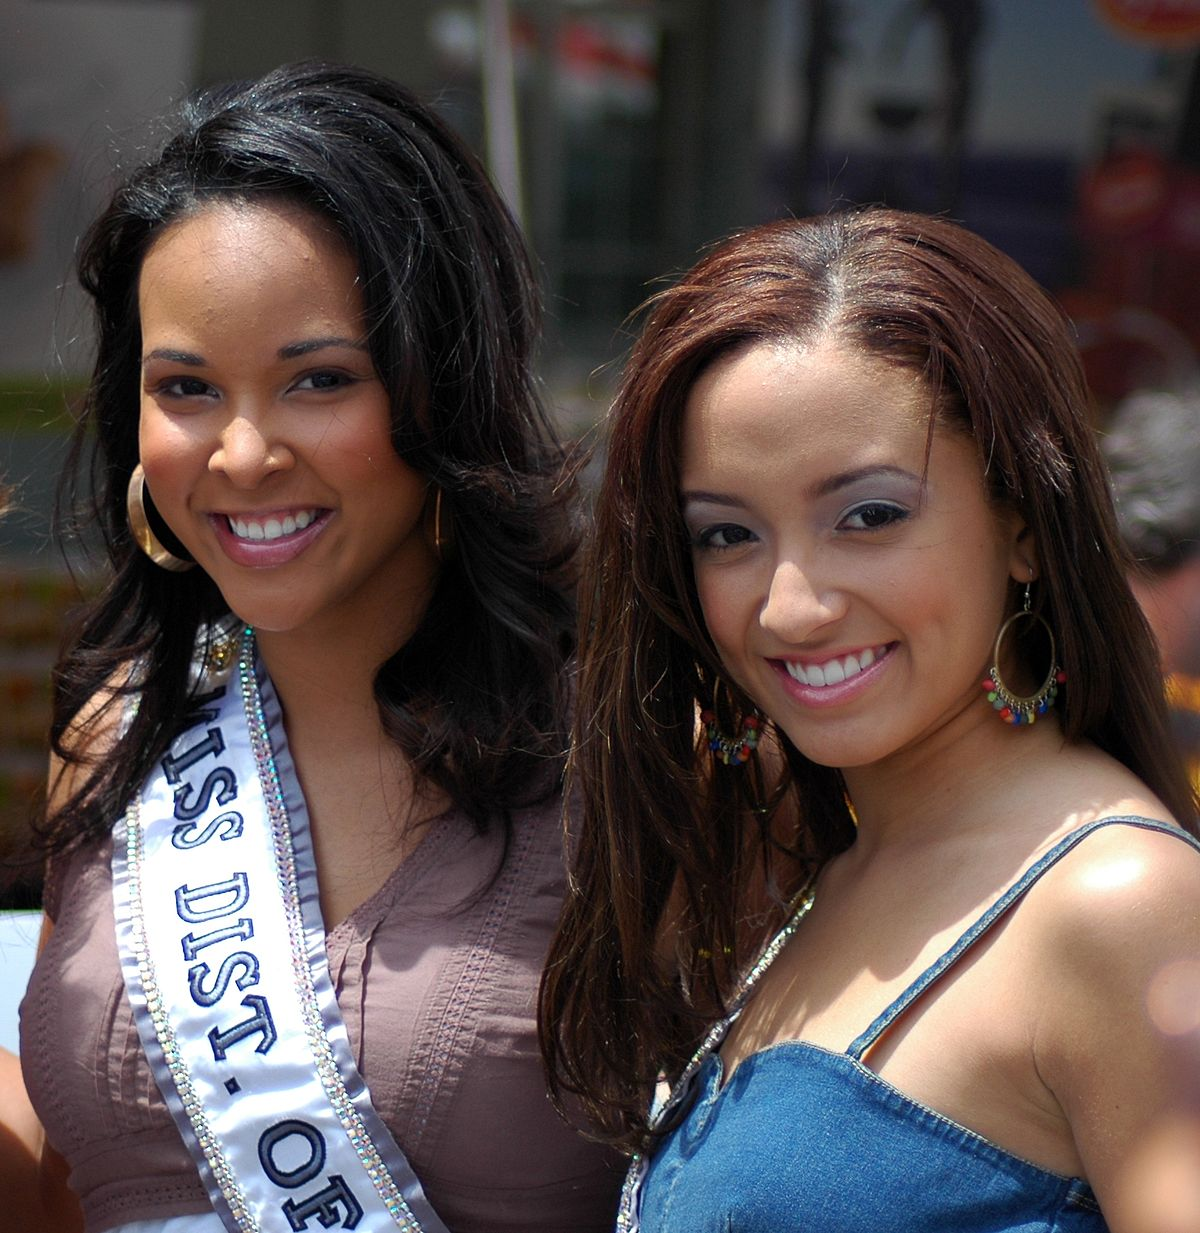 Miss District of Columbia Teen USA - Wikipedia